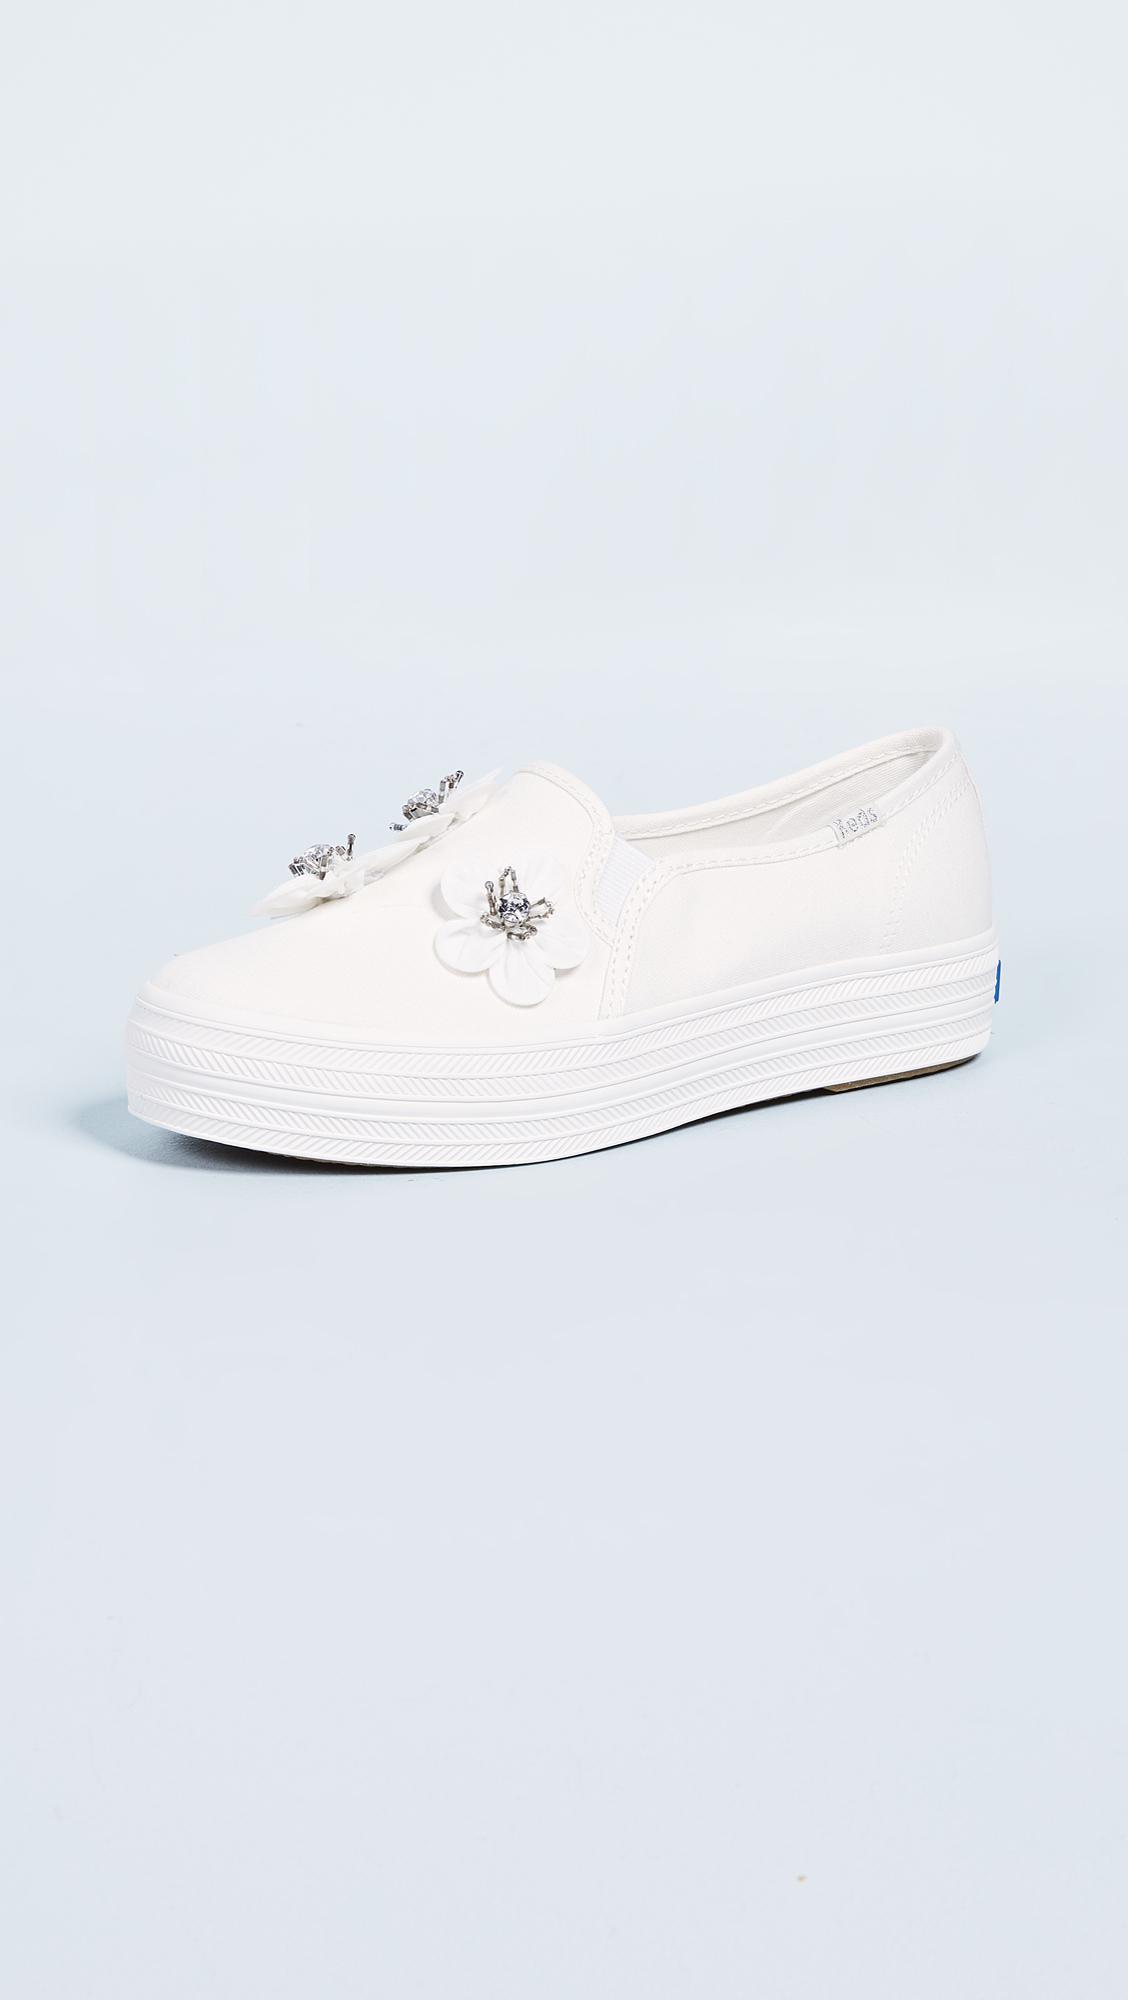 Keds Canvas X Kate Spade Triple Decker Flowers Slip On Sneakers in White